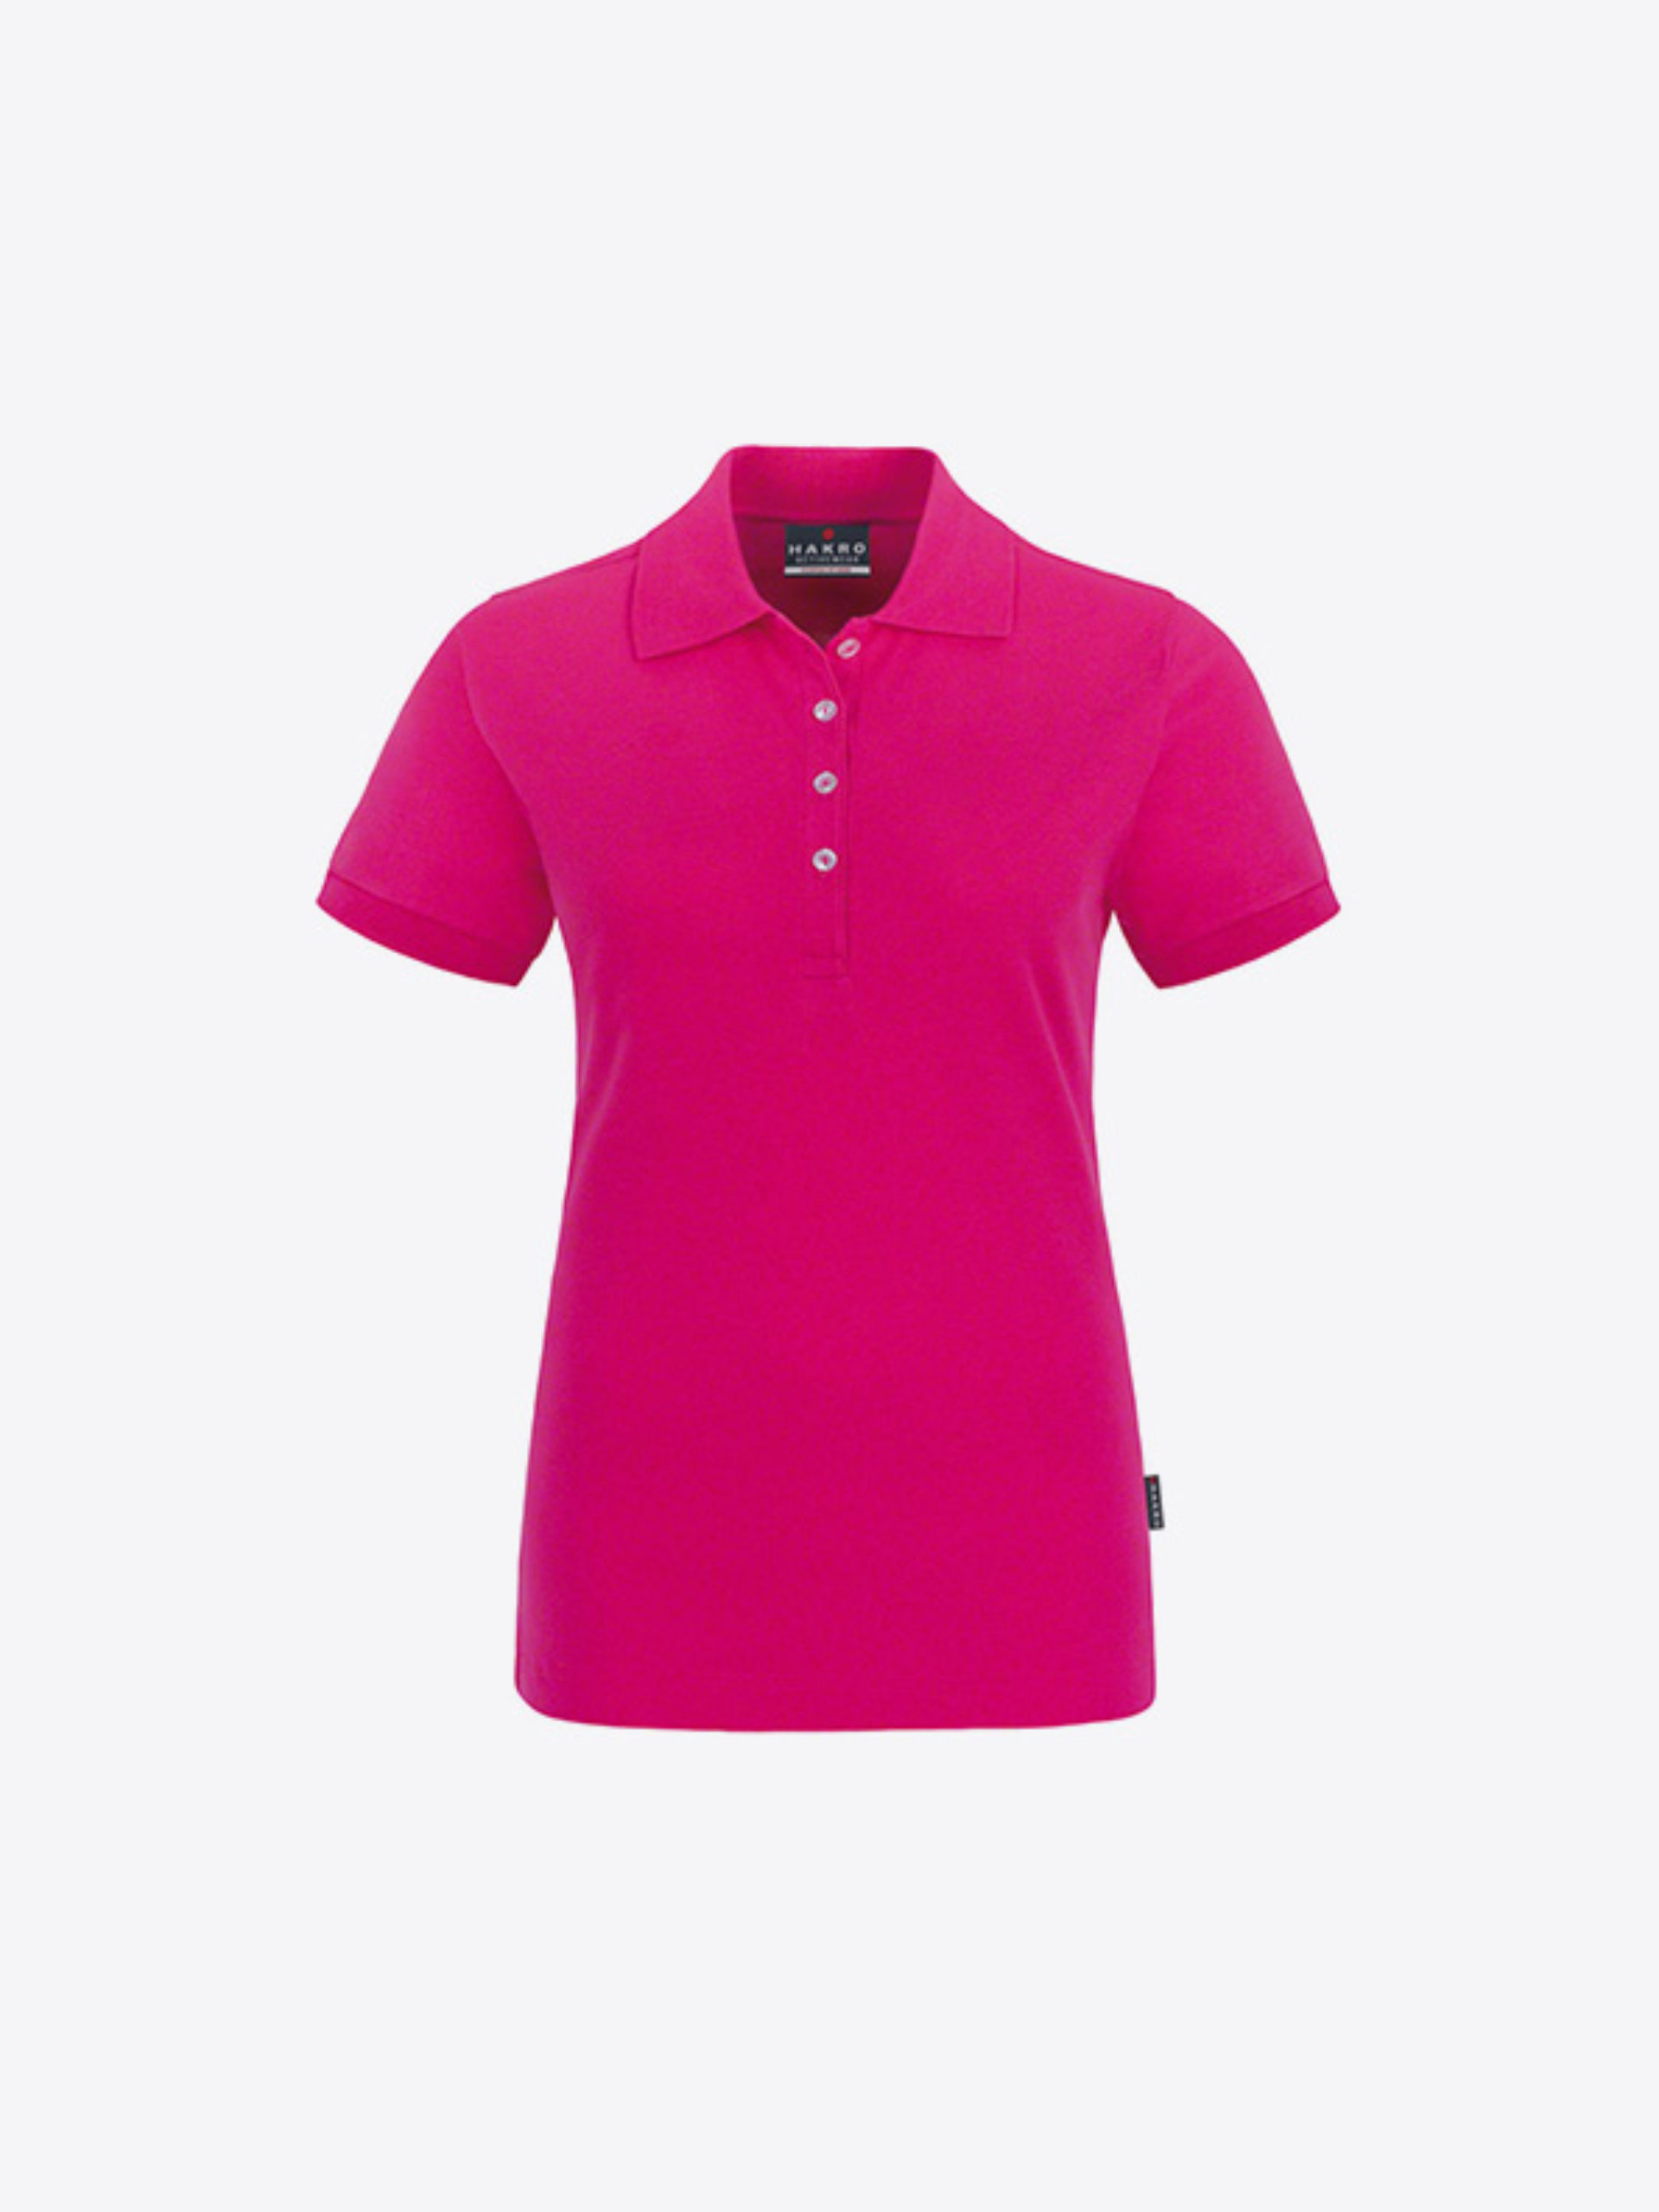 Damen Polo Shirt Bedrucken Lassen Hakro 222 Magenta